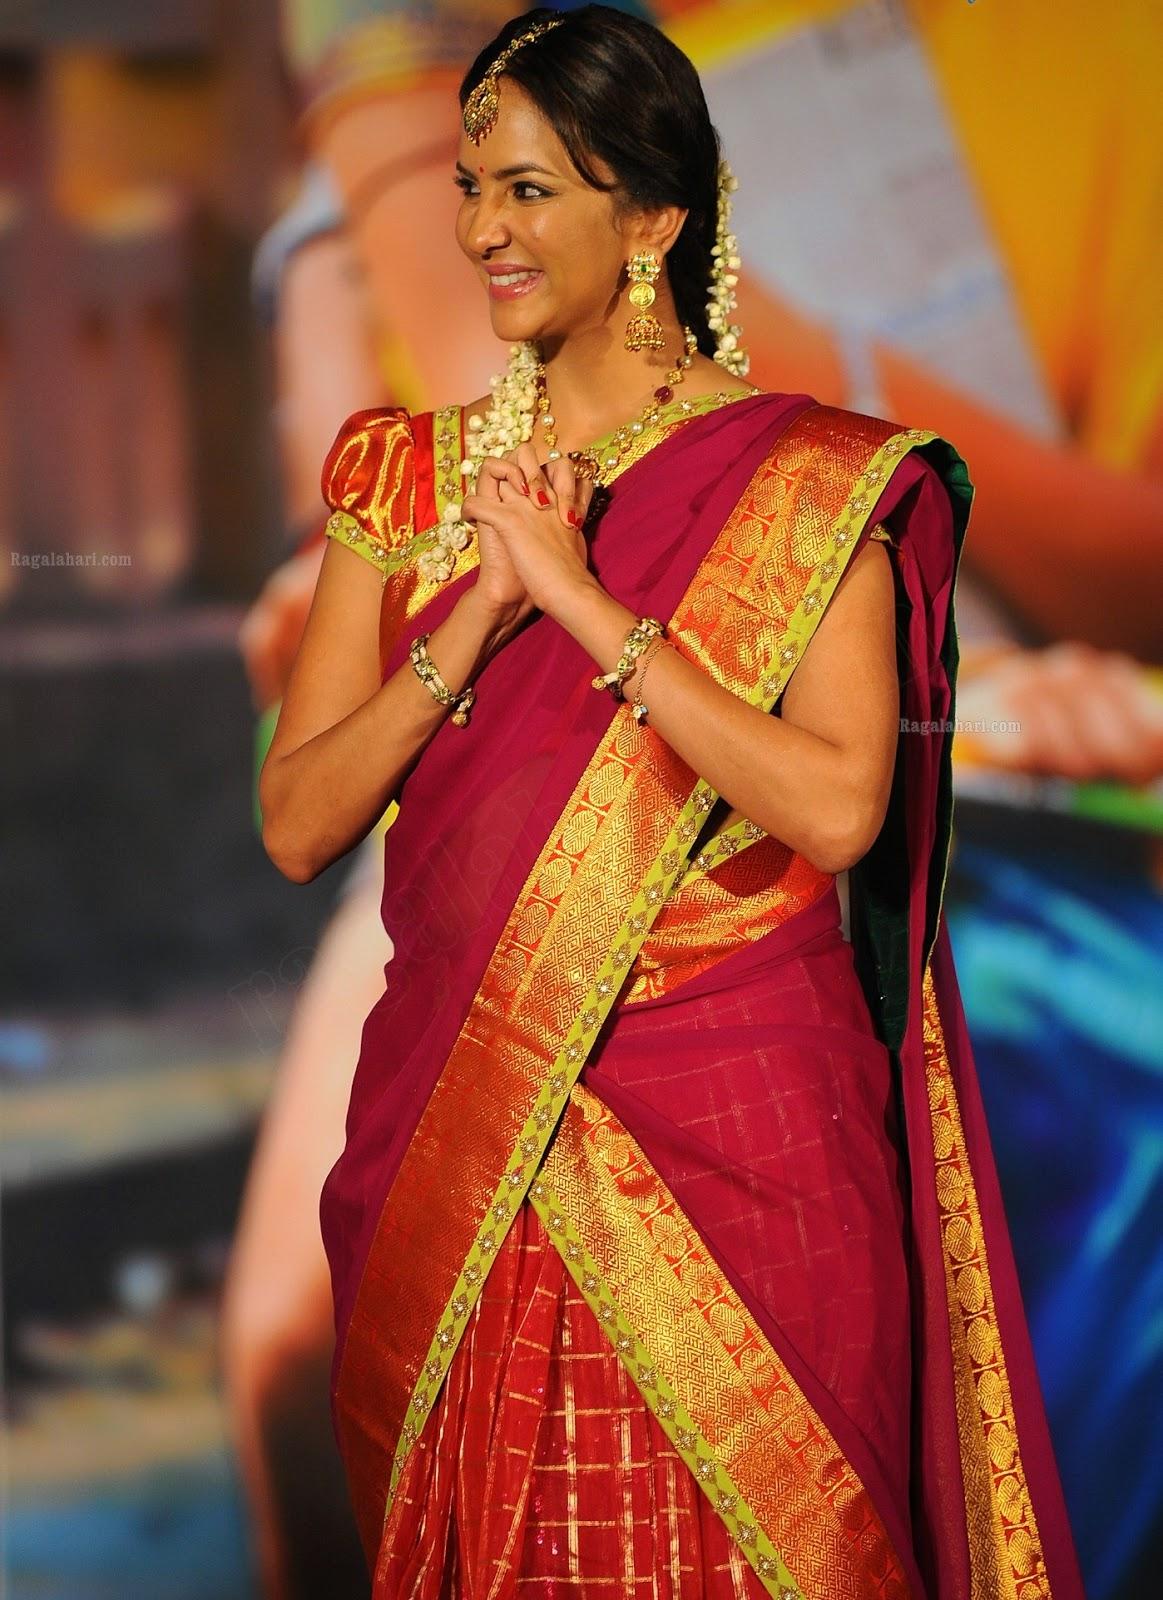 lakshmi prasanna in pattu langa hd photos